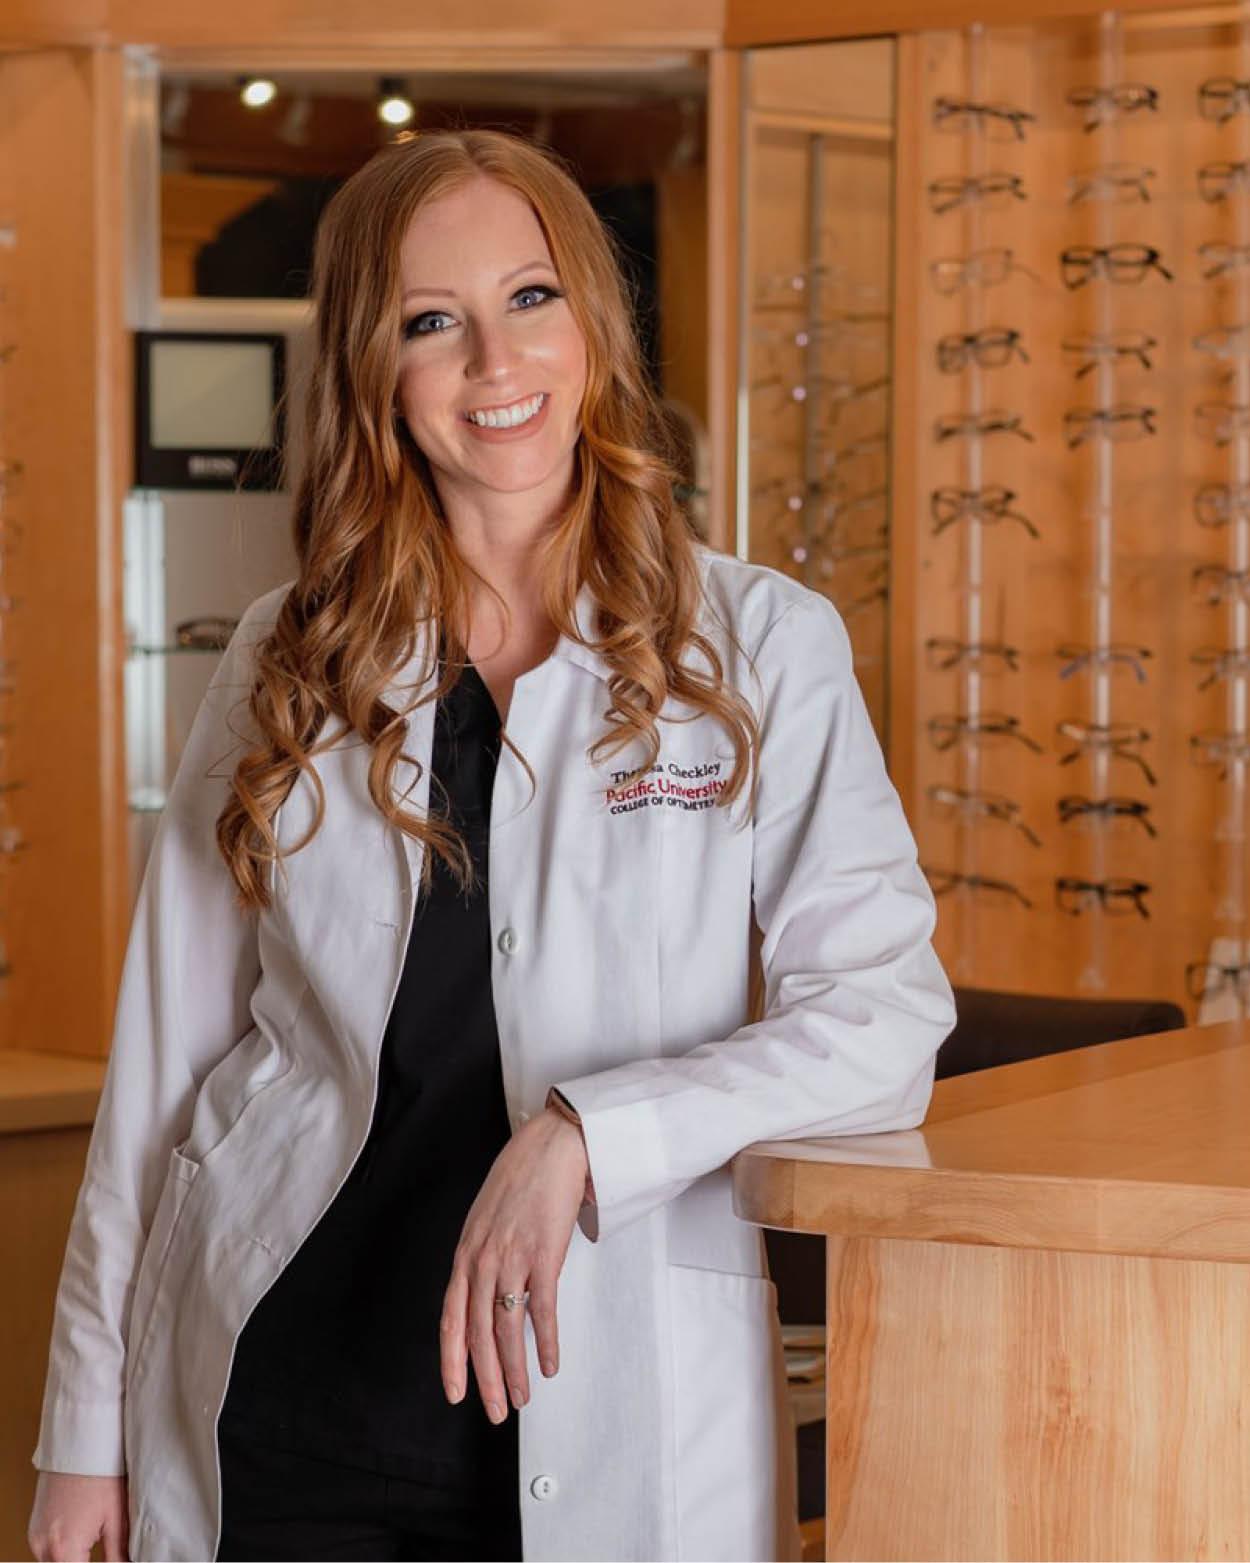 Dr. Theresa Checkley Athabasca Eye Doctor